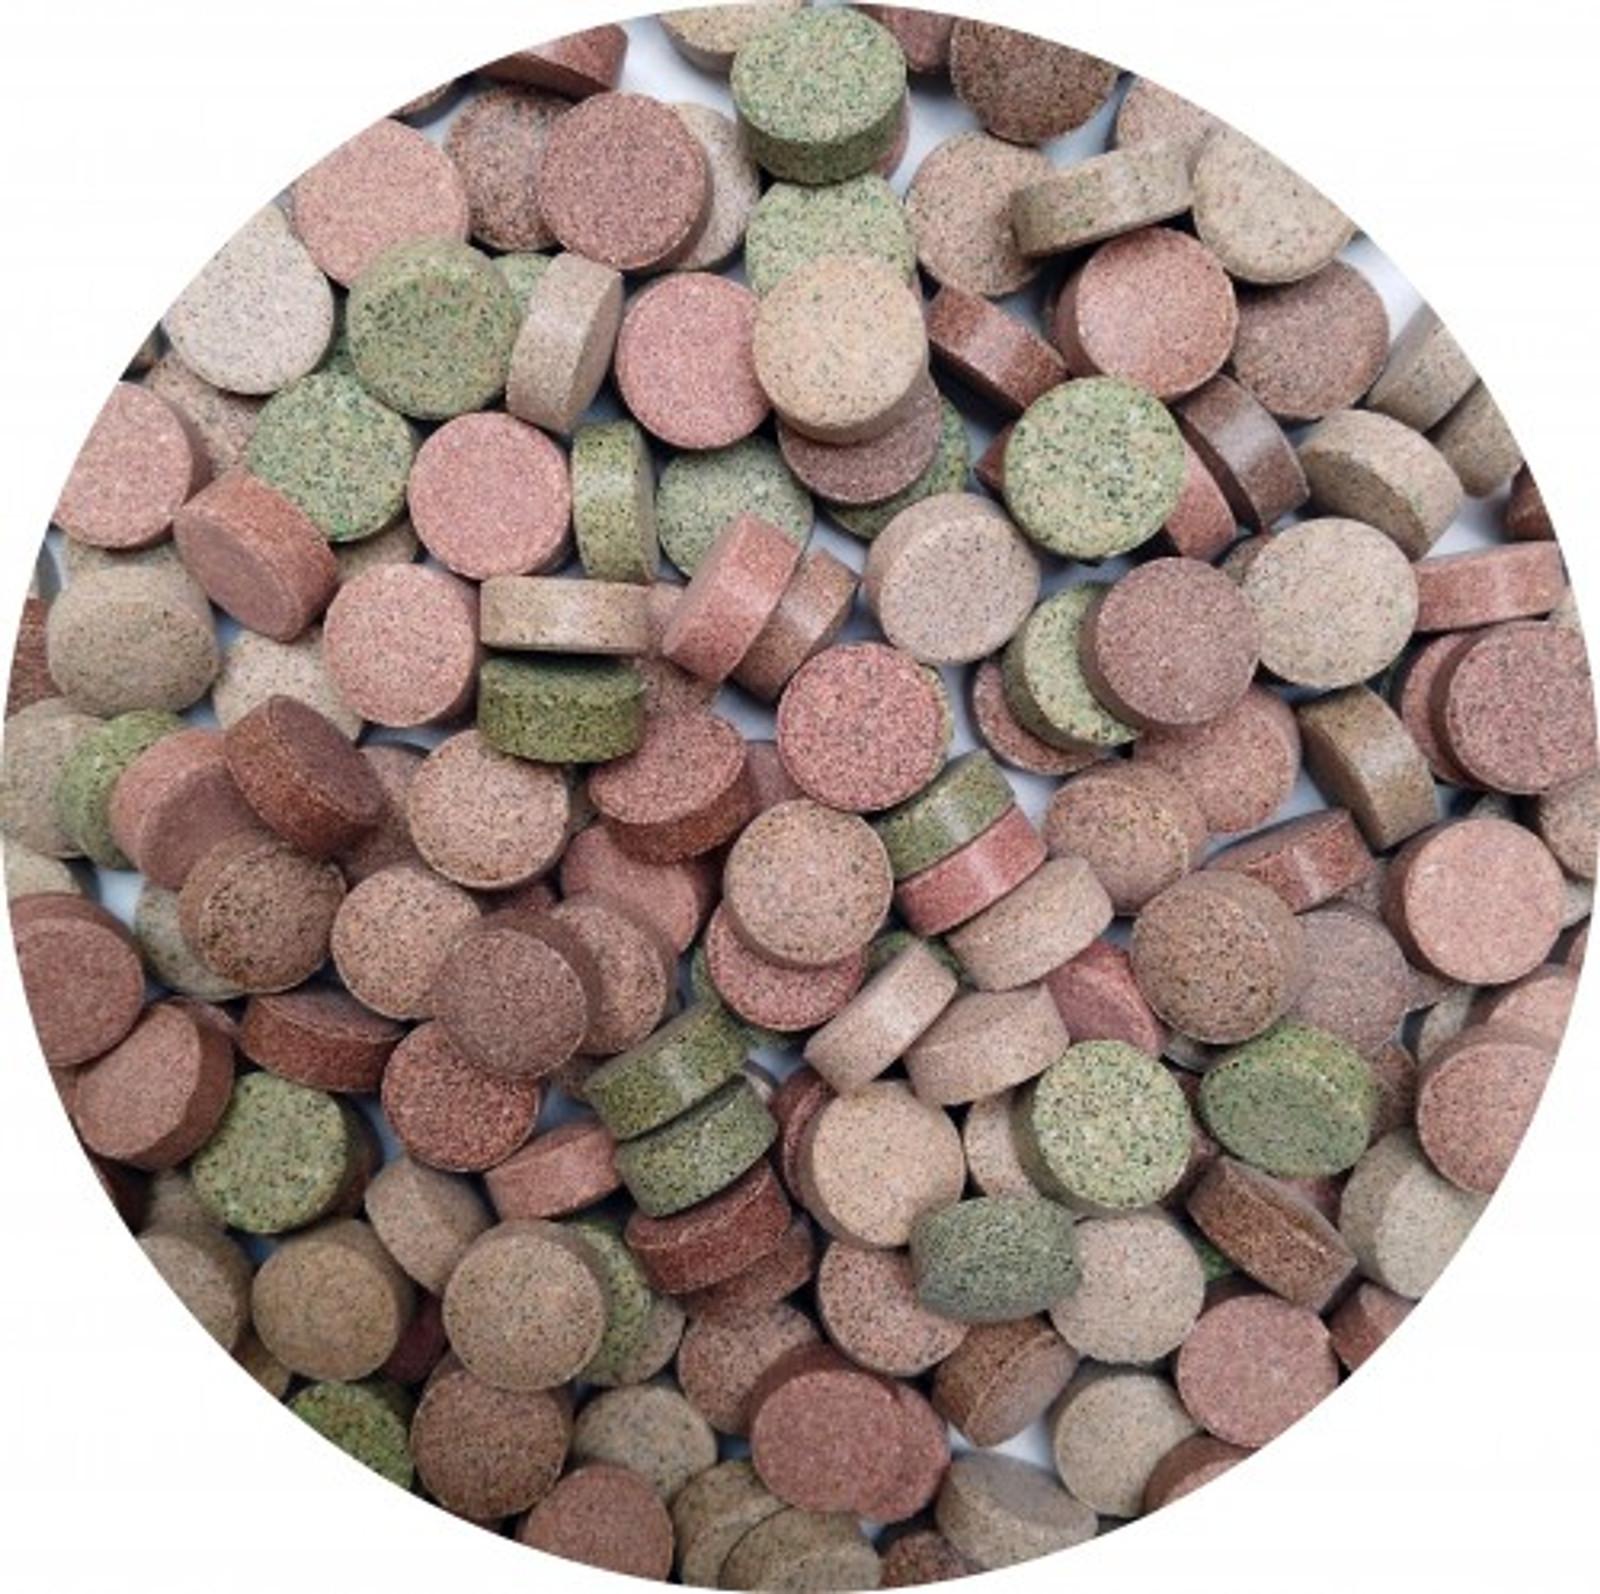 Aquaristik-Paradies Futtertabletten 14-Sorten-Mix 187,5 g (ca. 250 ml) – Bild 1